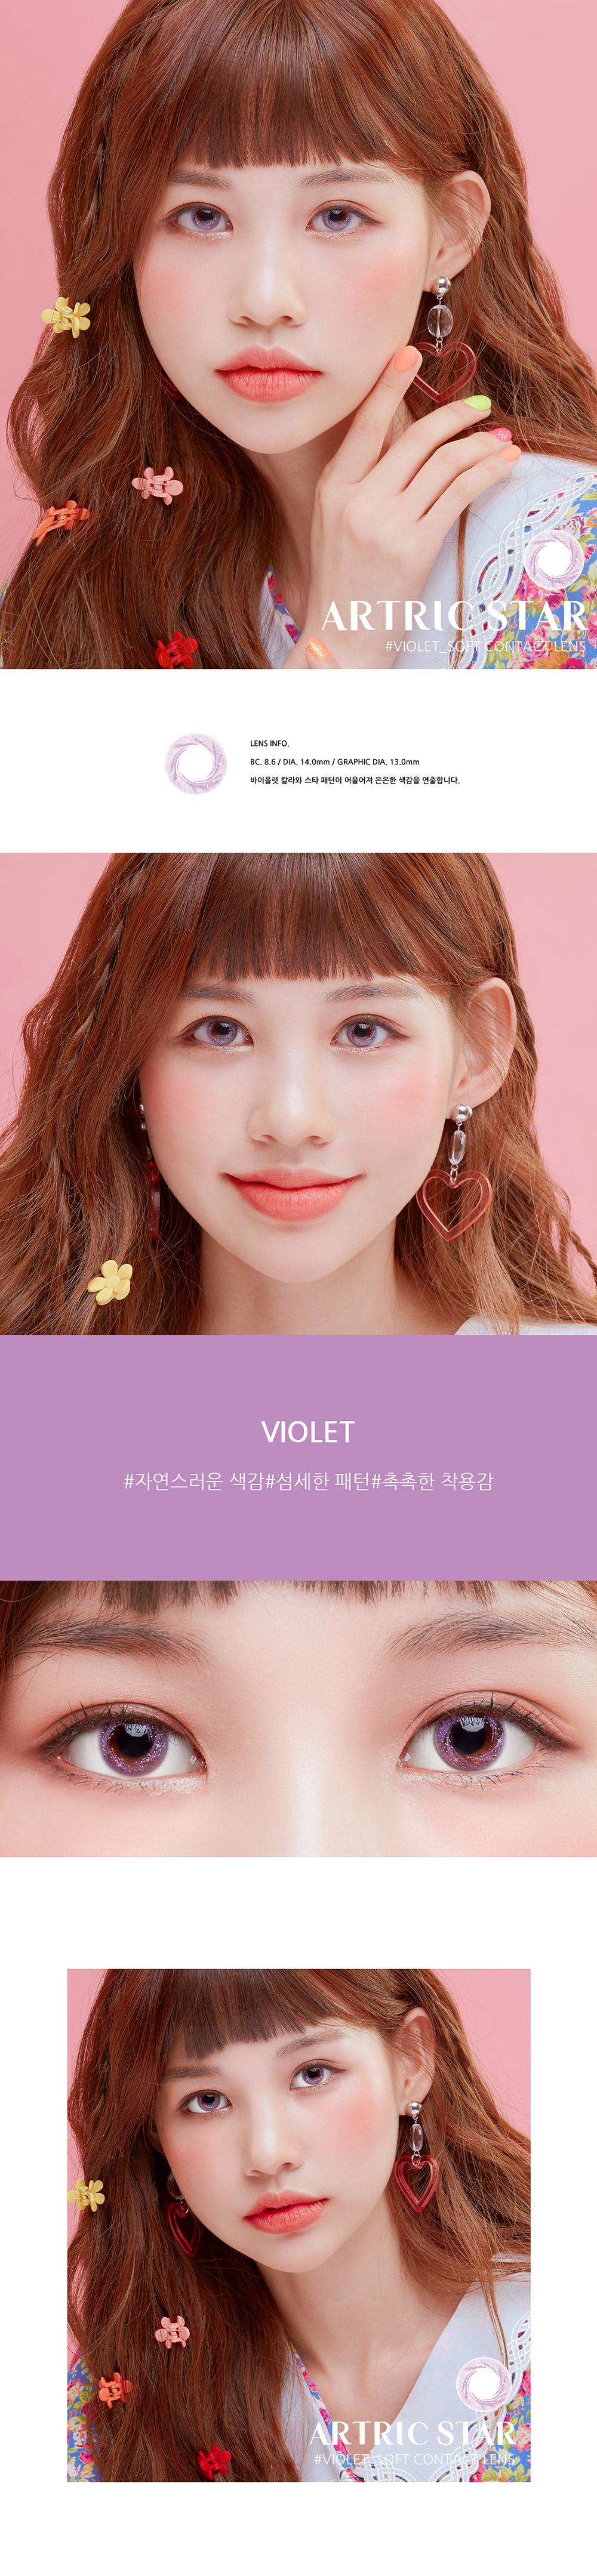 artric-star-violet-1.jpg